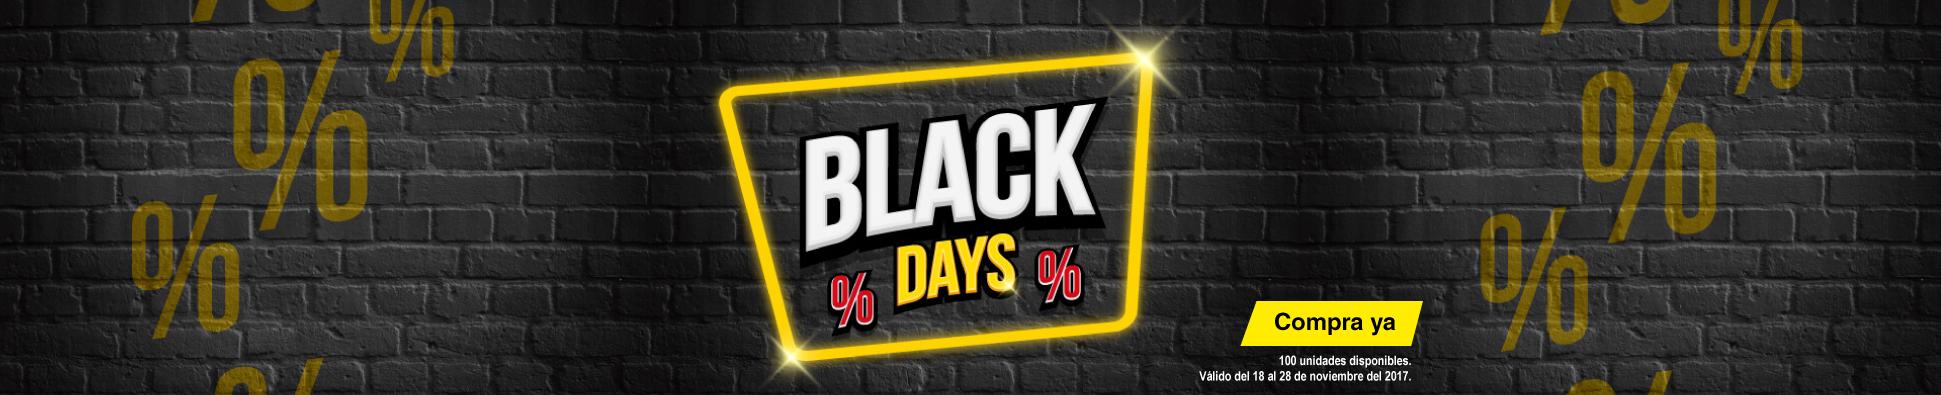 PPAL ALKP-1-blackfriday-prod-noviembre22-28